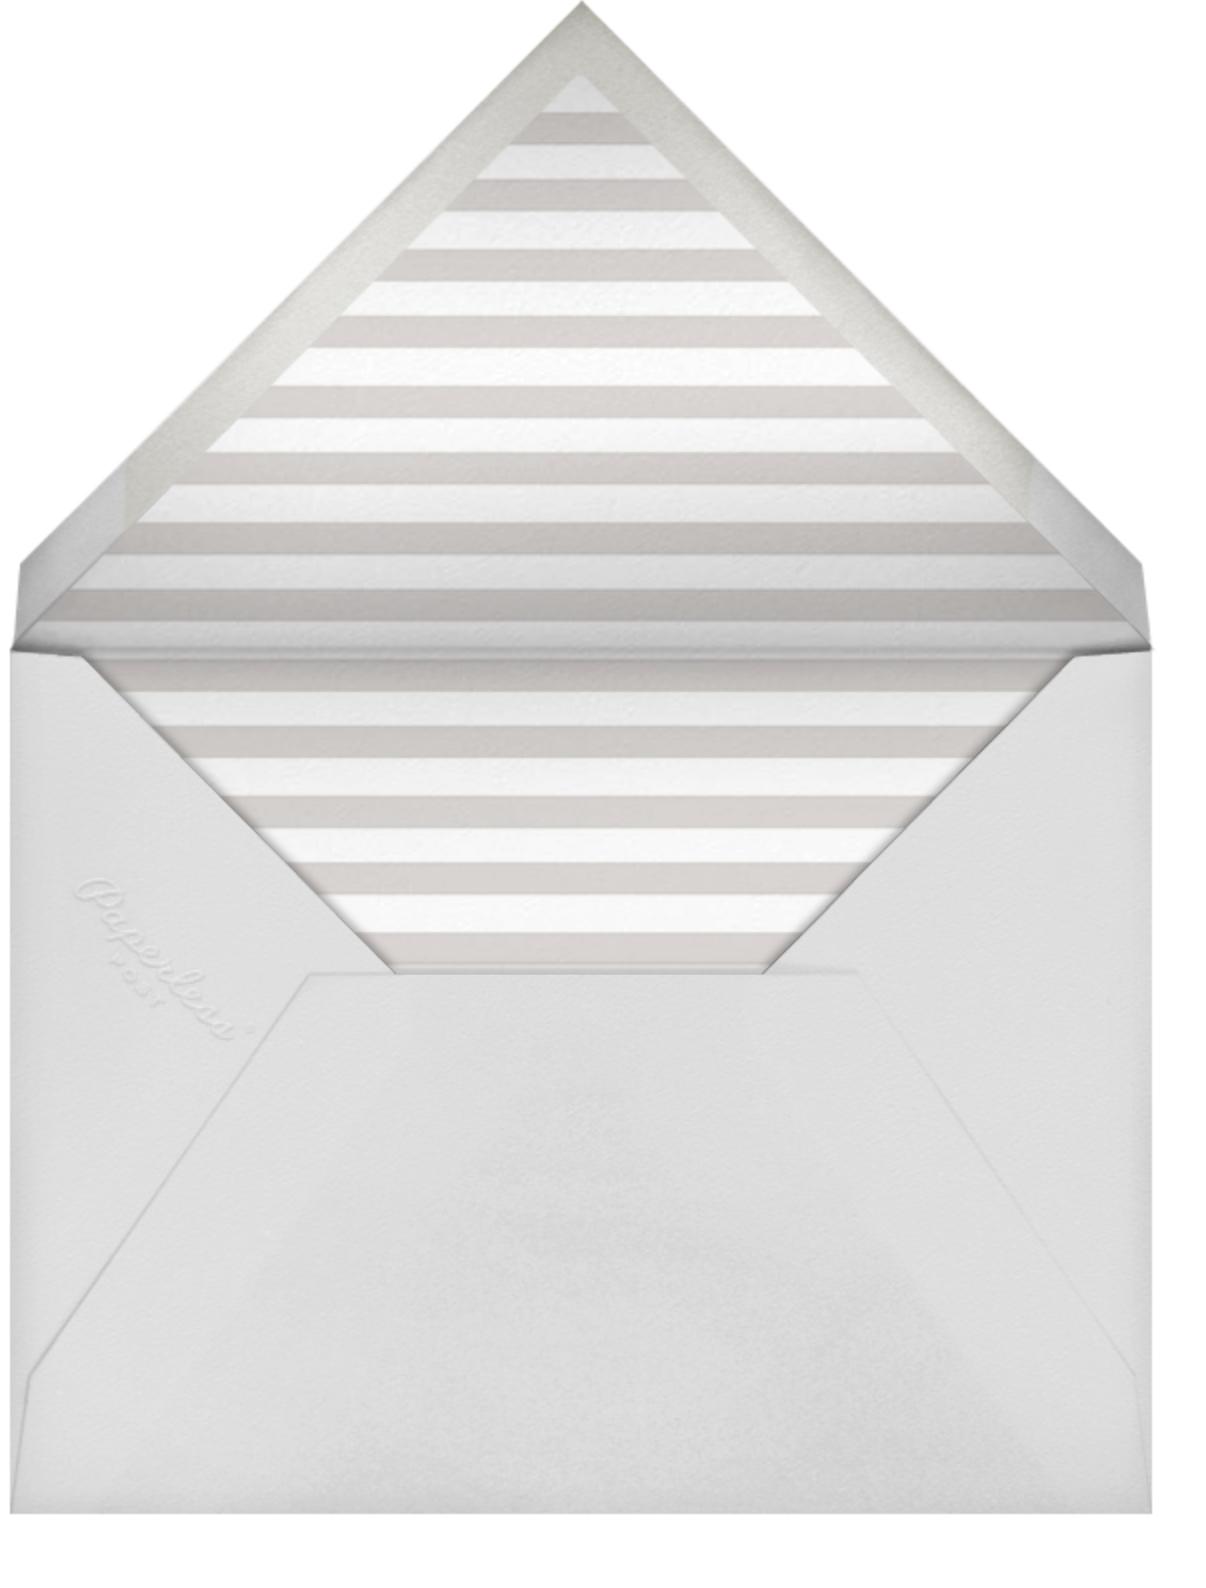 Luminous Heart - Pacific/Gold - Sugar Paper - Baby shower - envelope back